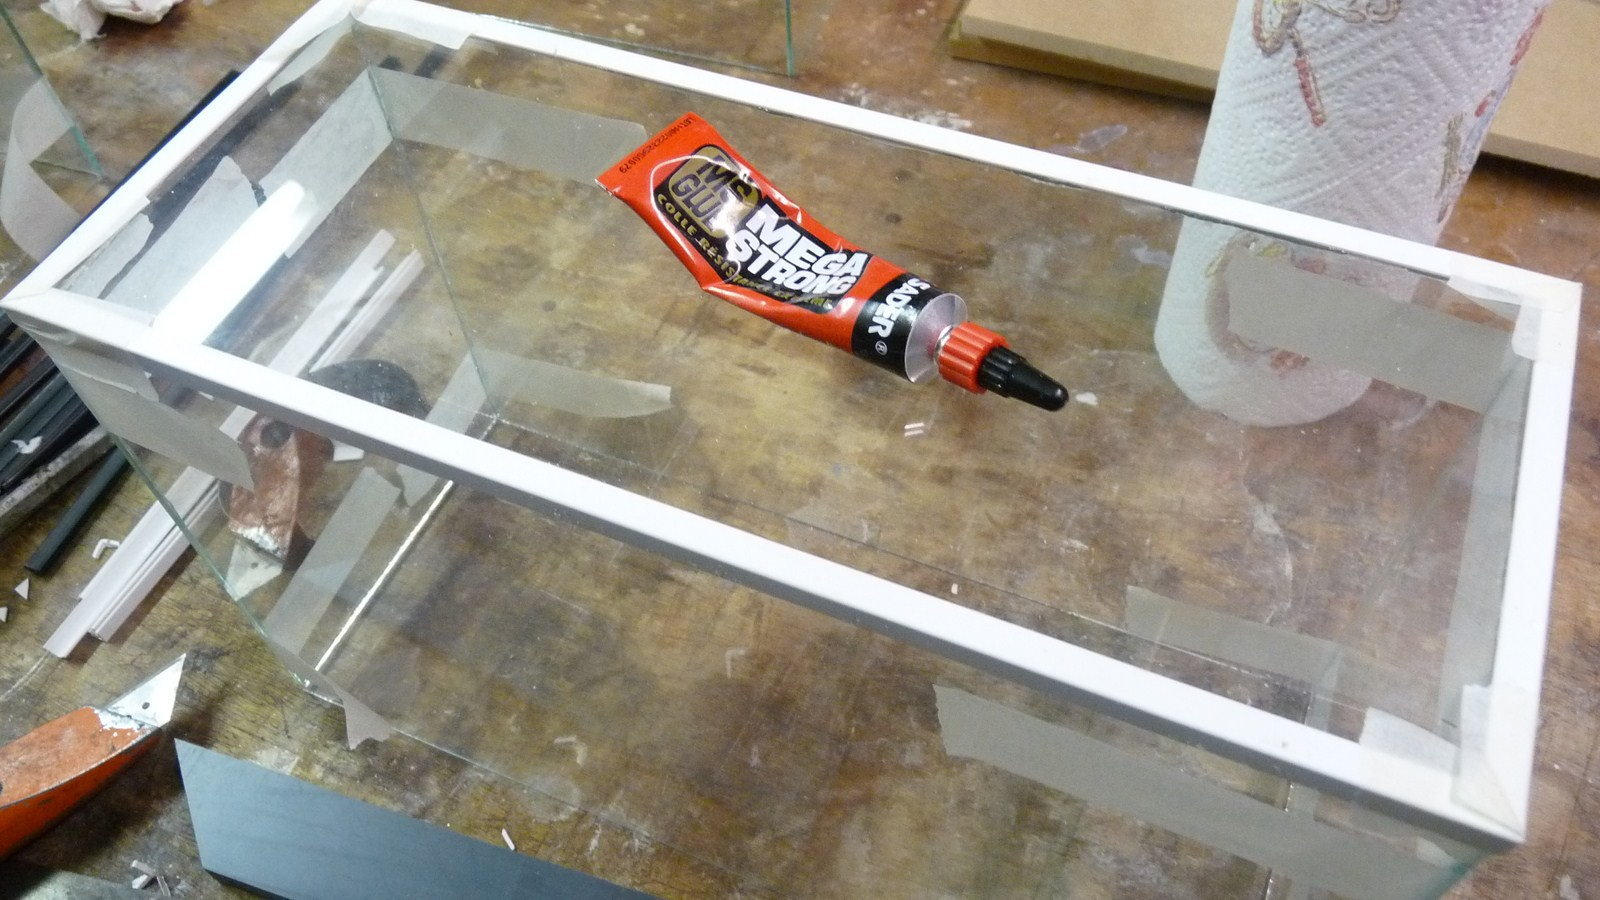 Fabriquer ses propres vitrines en verre 17071907265623134915156554